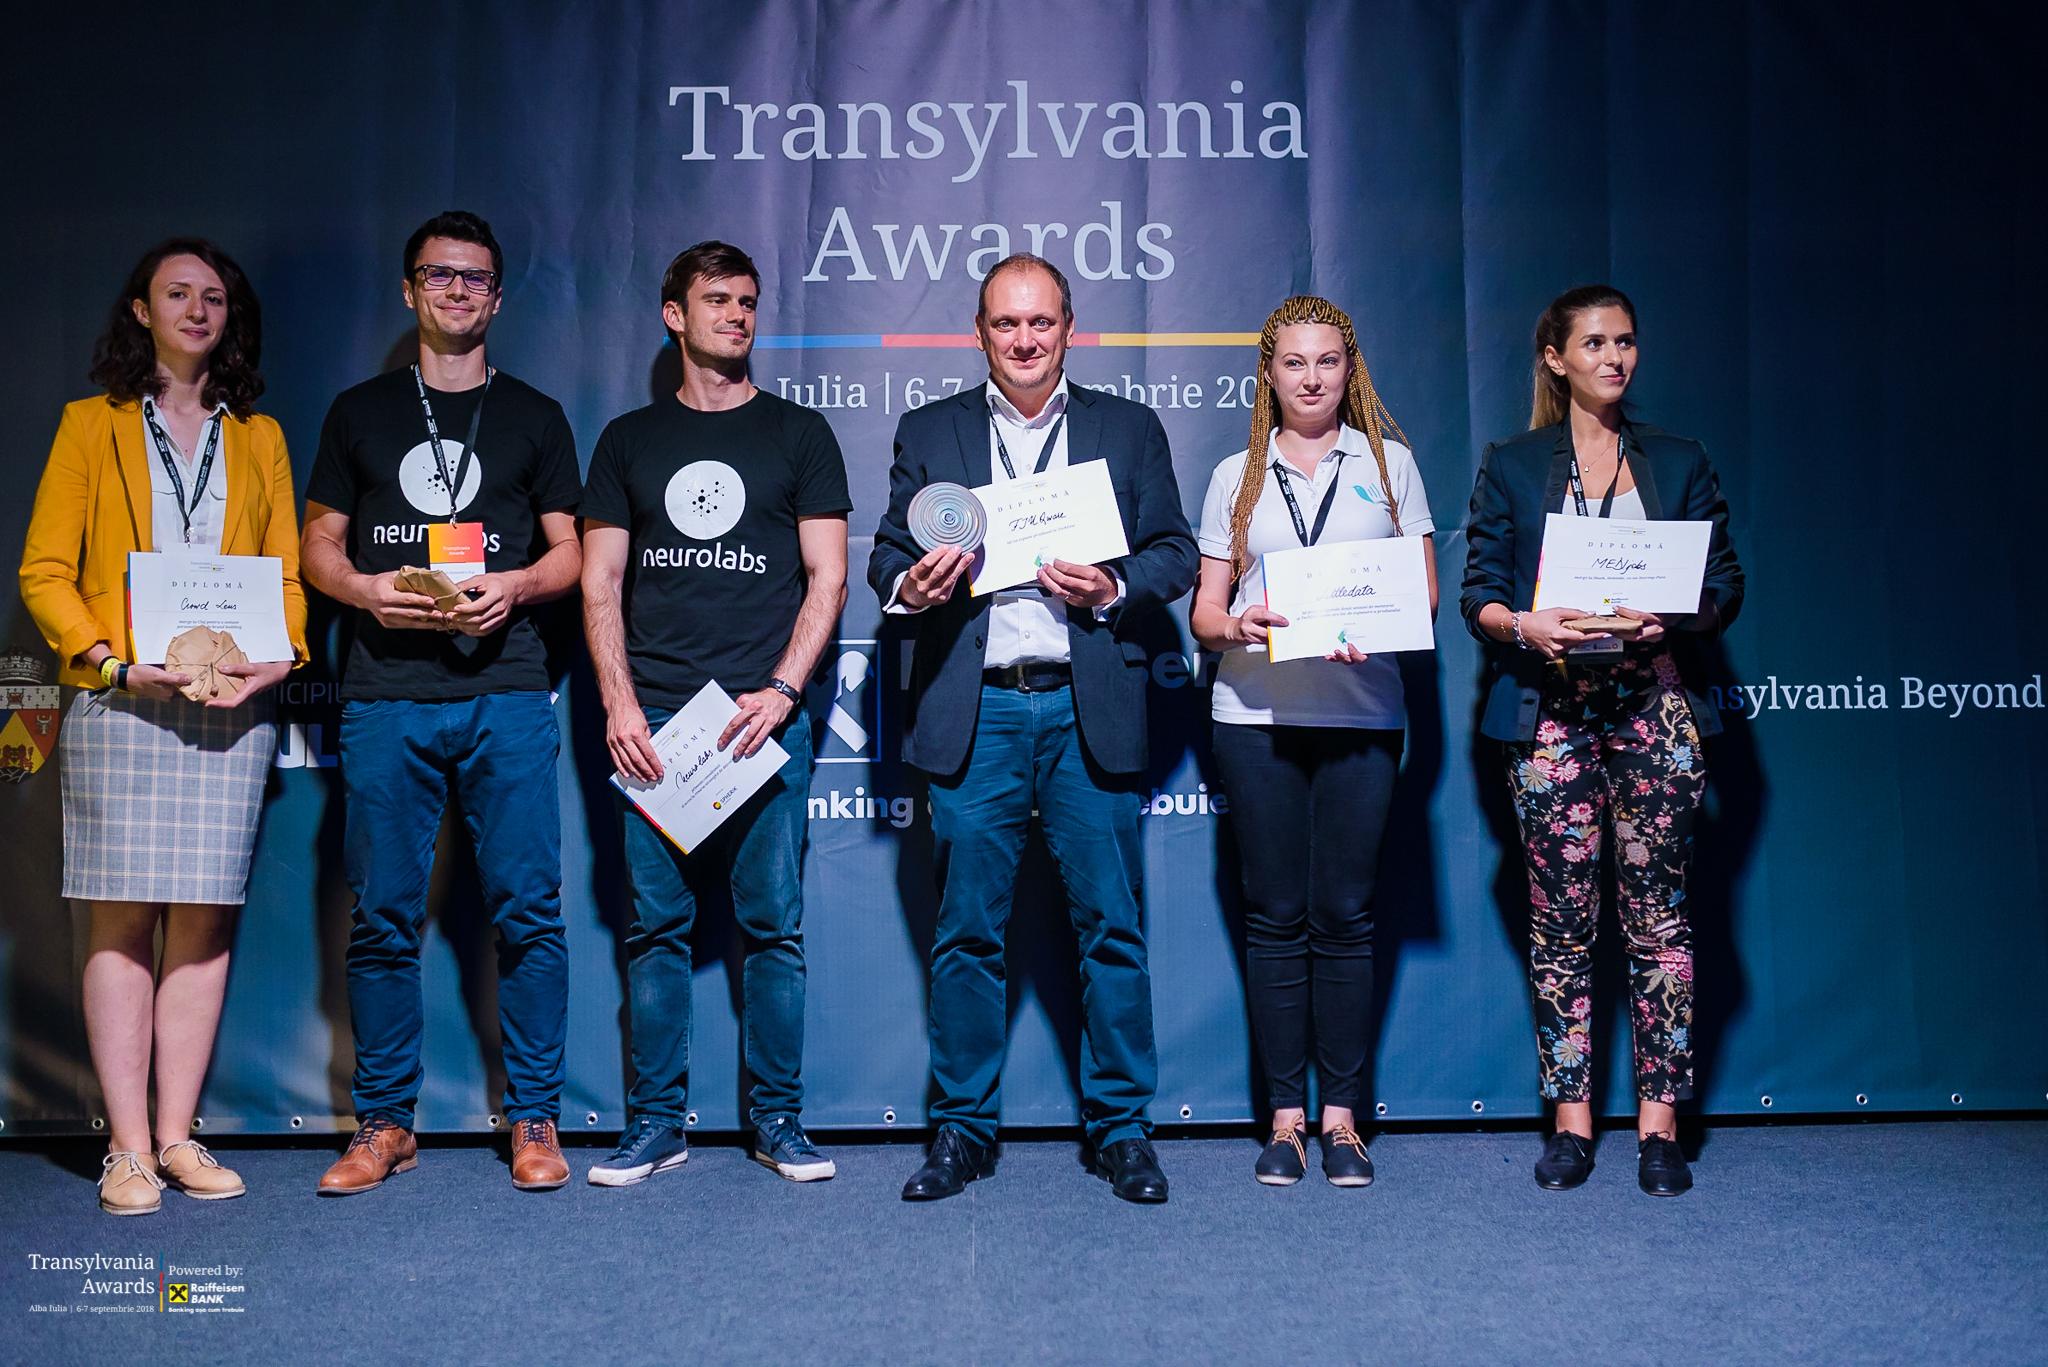 transylvania awards septembrie 2018_06_09_2018_Vlad Cupsa_VL2_1348.jpg